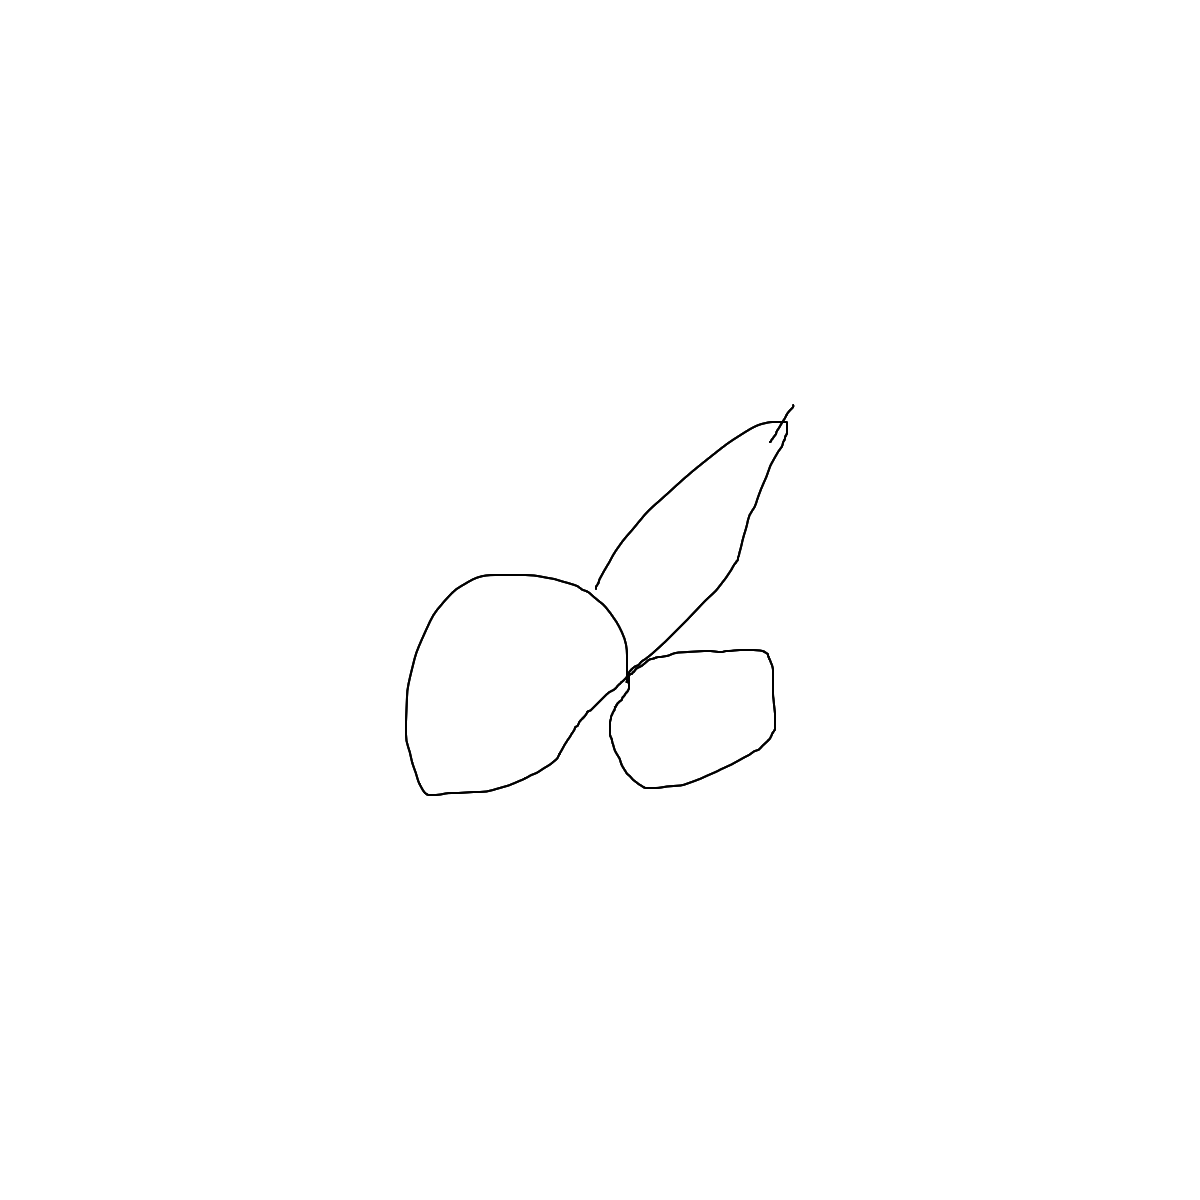 BAAAM drawing#2569 lat:41.8863868713378900lng: -87.9472351074218800